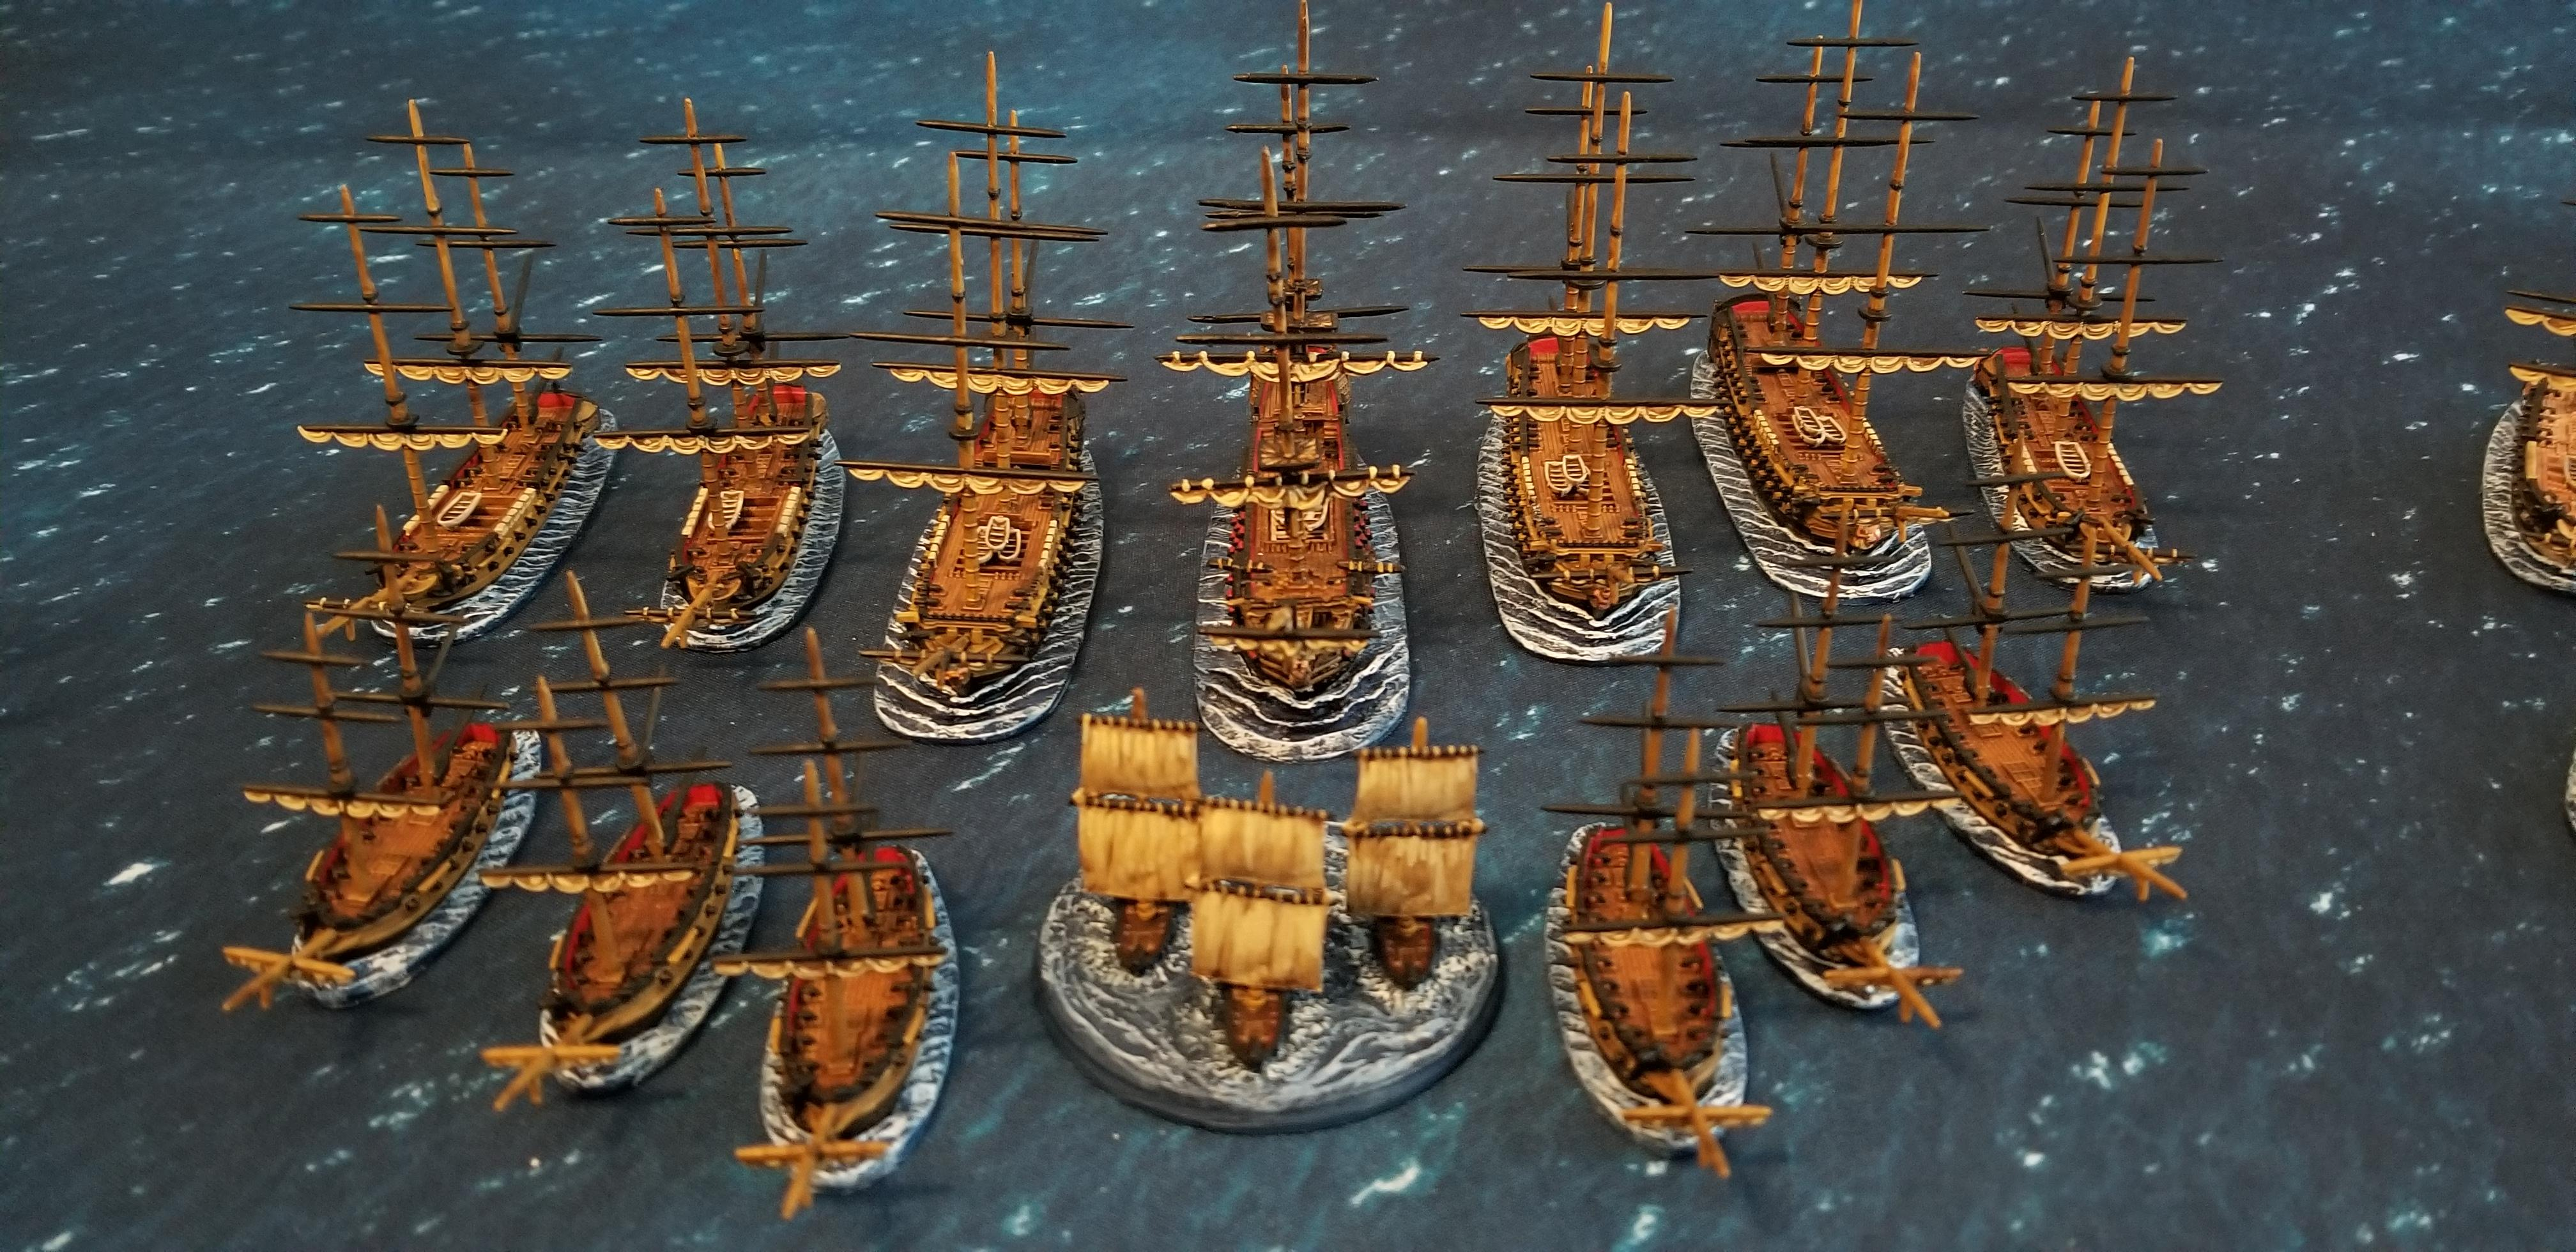 Black Seas, Navy, Pirate, Sail, Ships